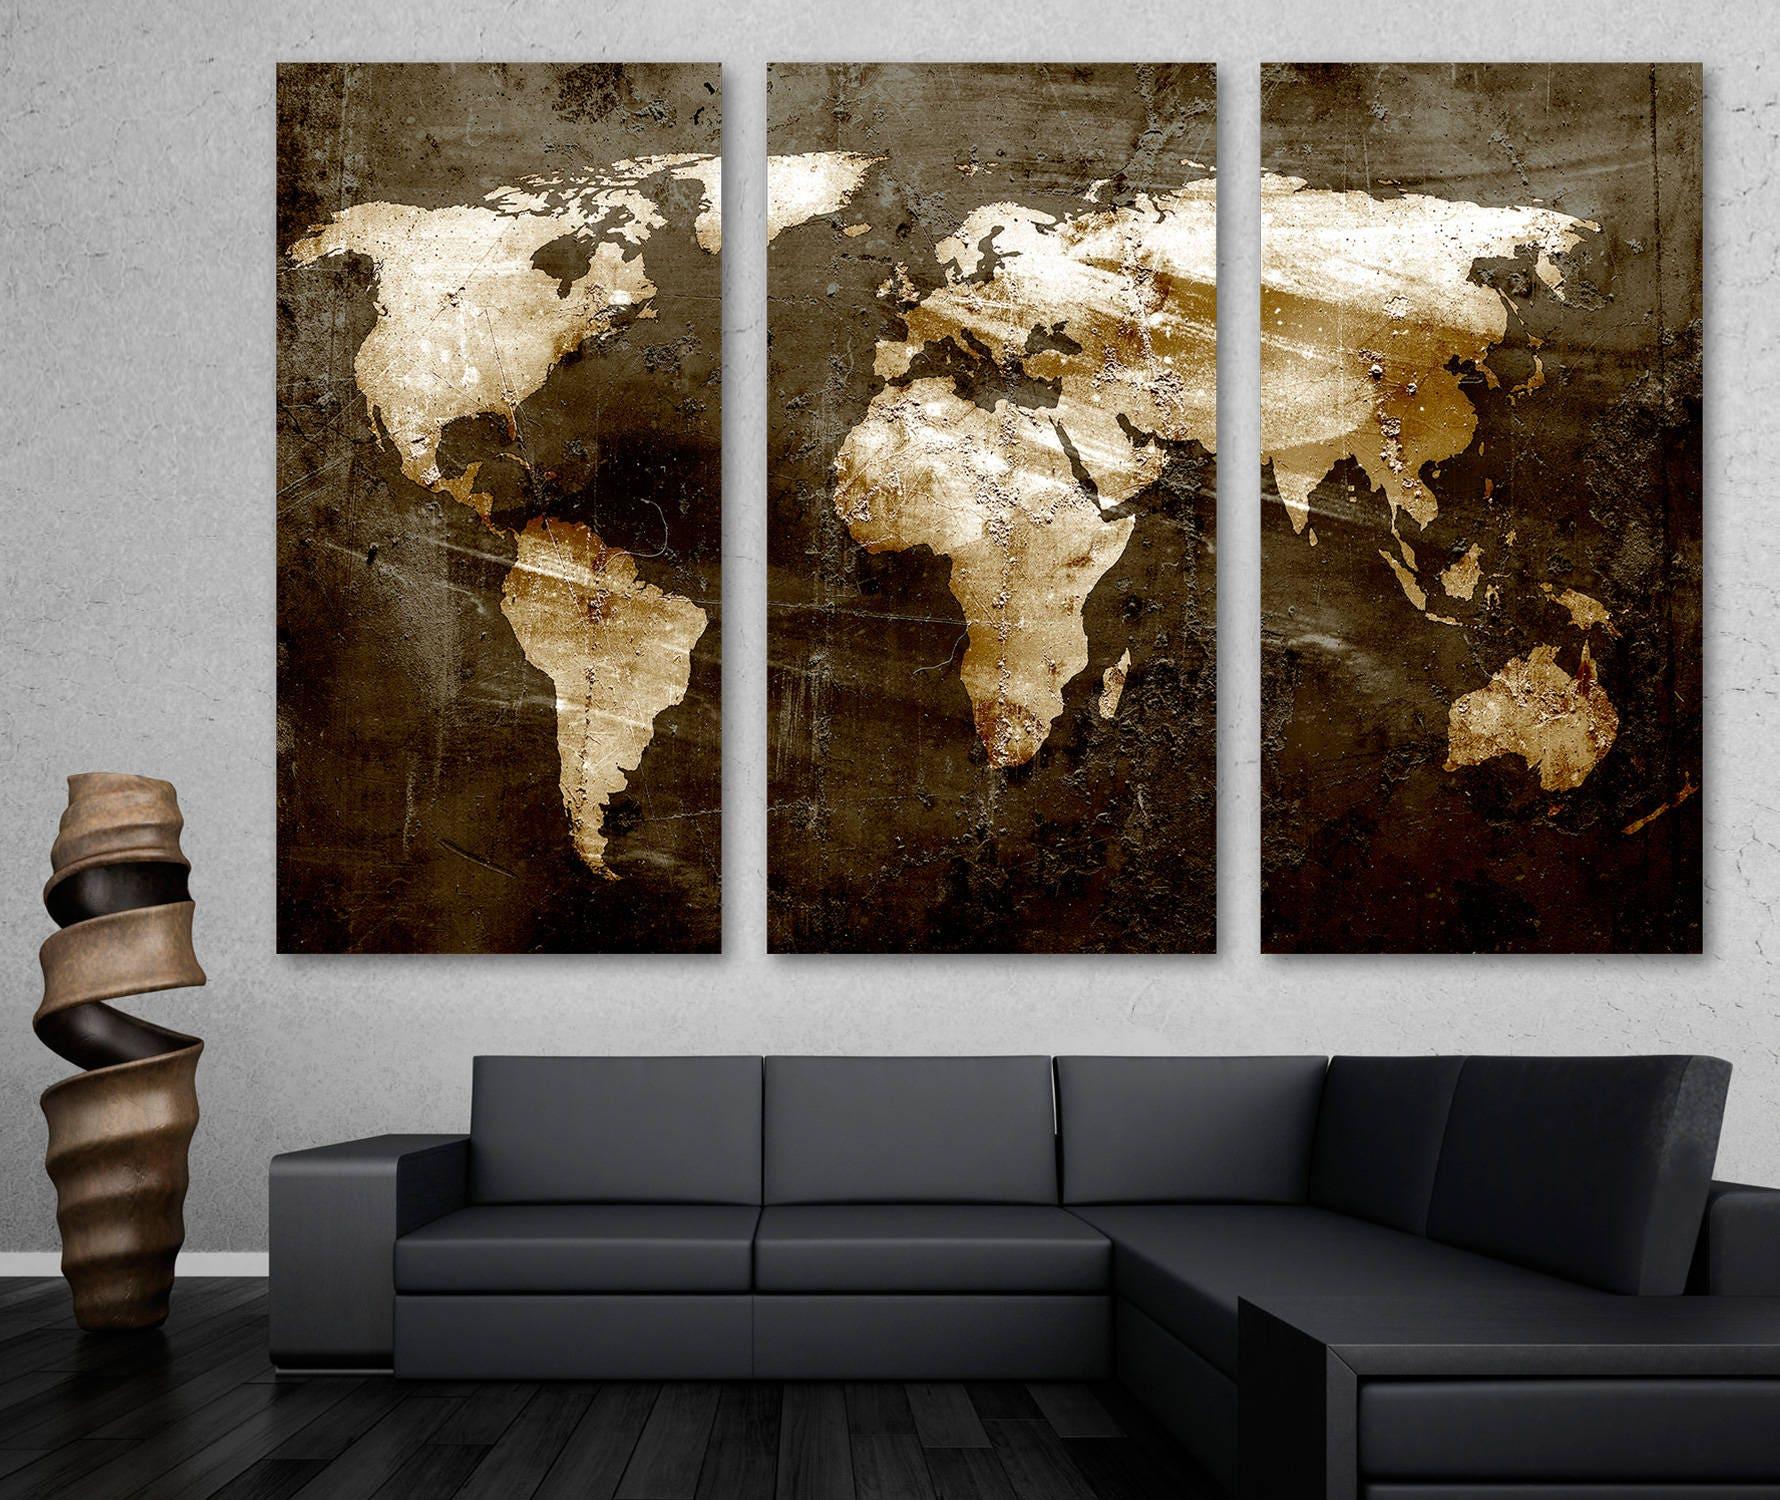 3 Panel Split Art World Map Canvas Print Triptych For: Rustic Brown World Map Canvas Print Wall Art 3 Panel Split